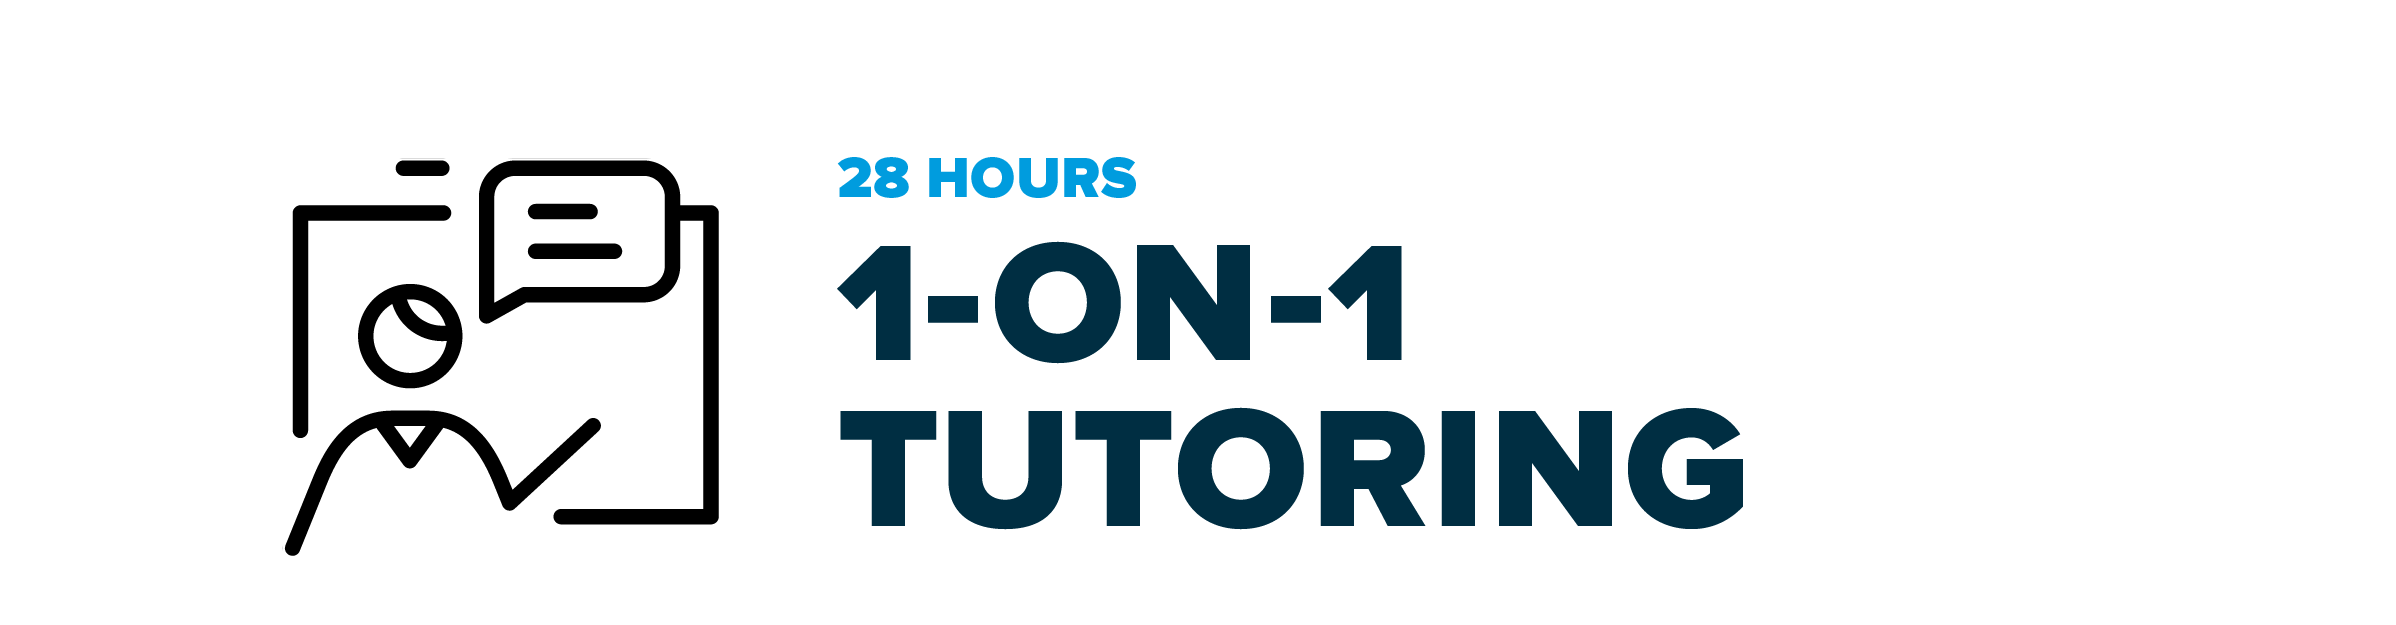 Infographic-05-tutoring.png